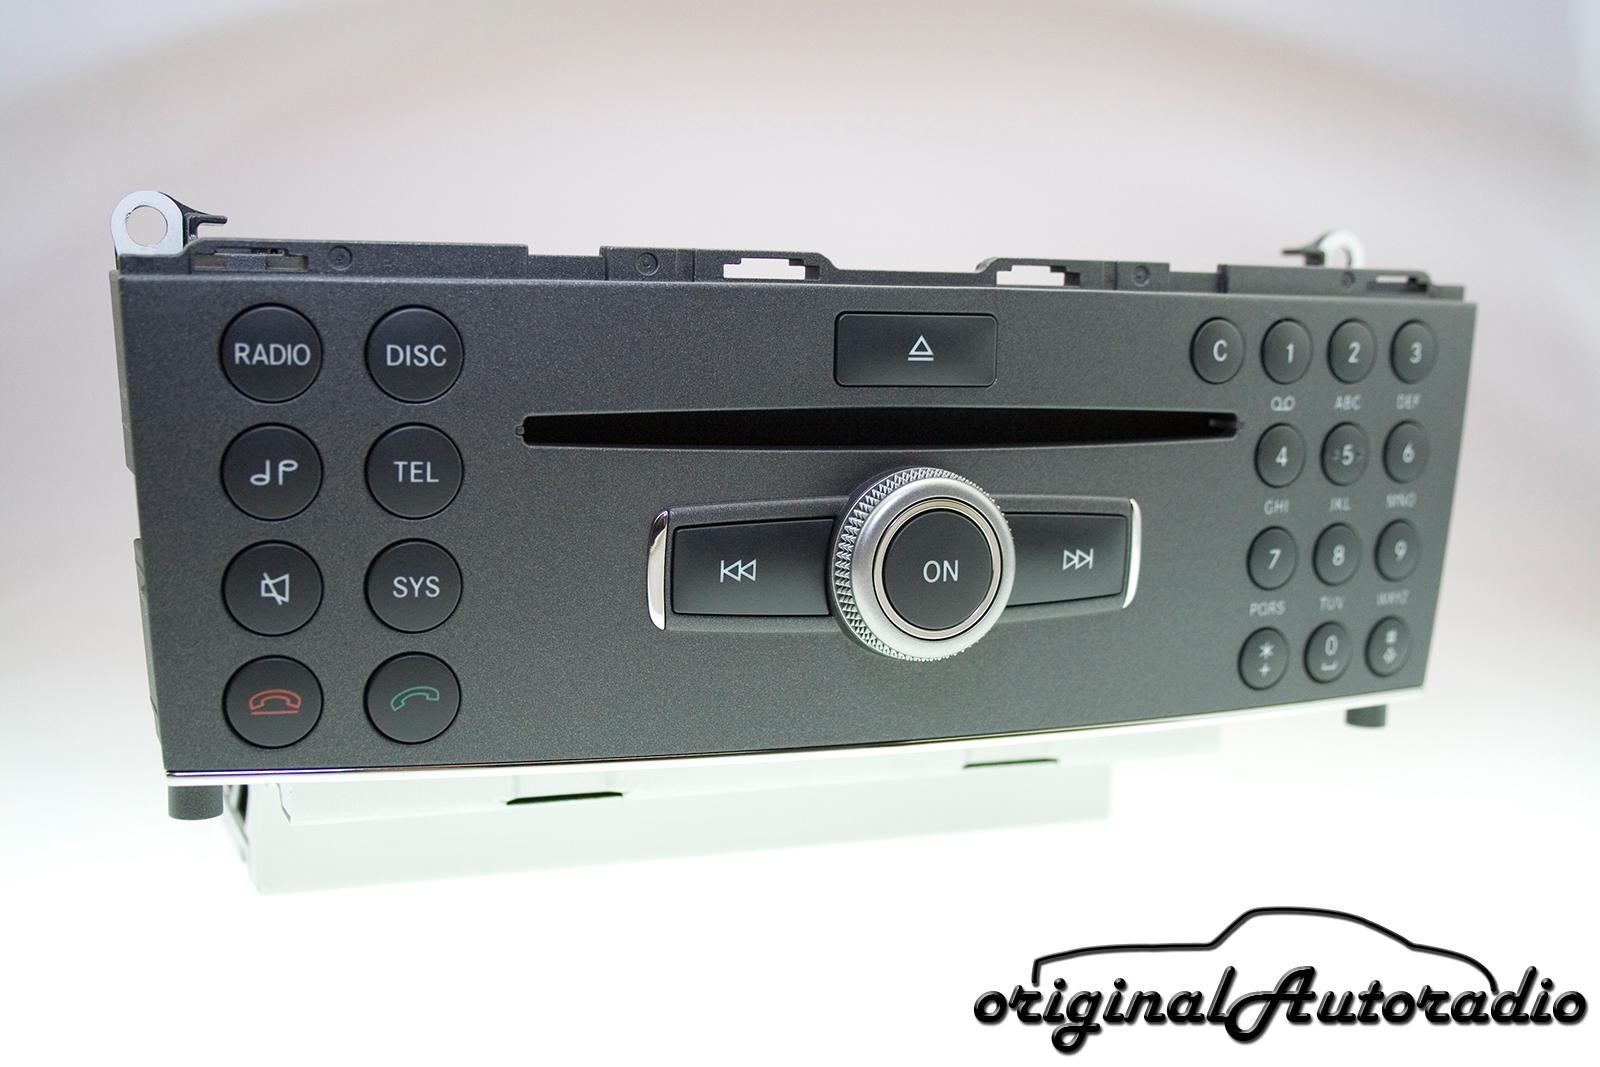 Original-Autoradio de - Mercedes W204 Radio Audio 20 CD Headunit MP3